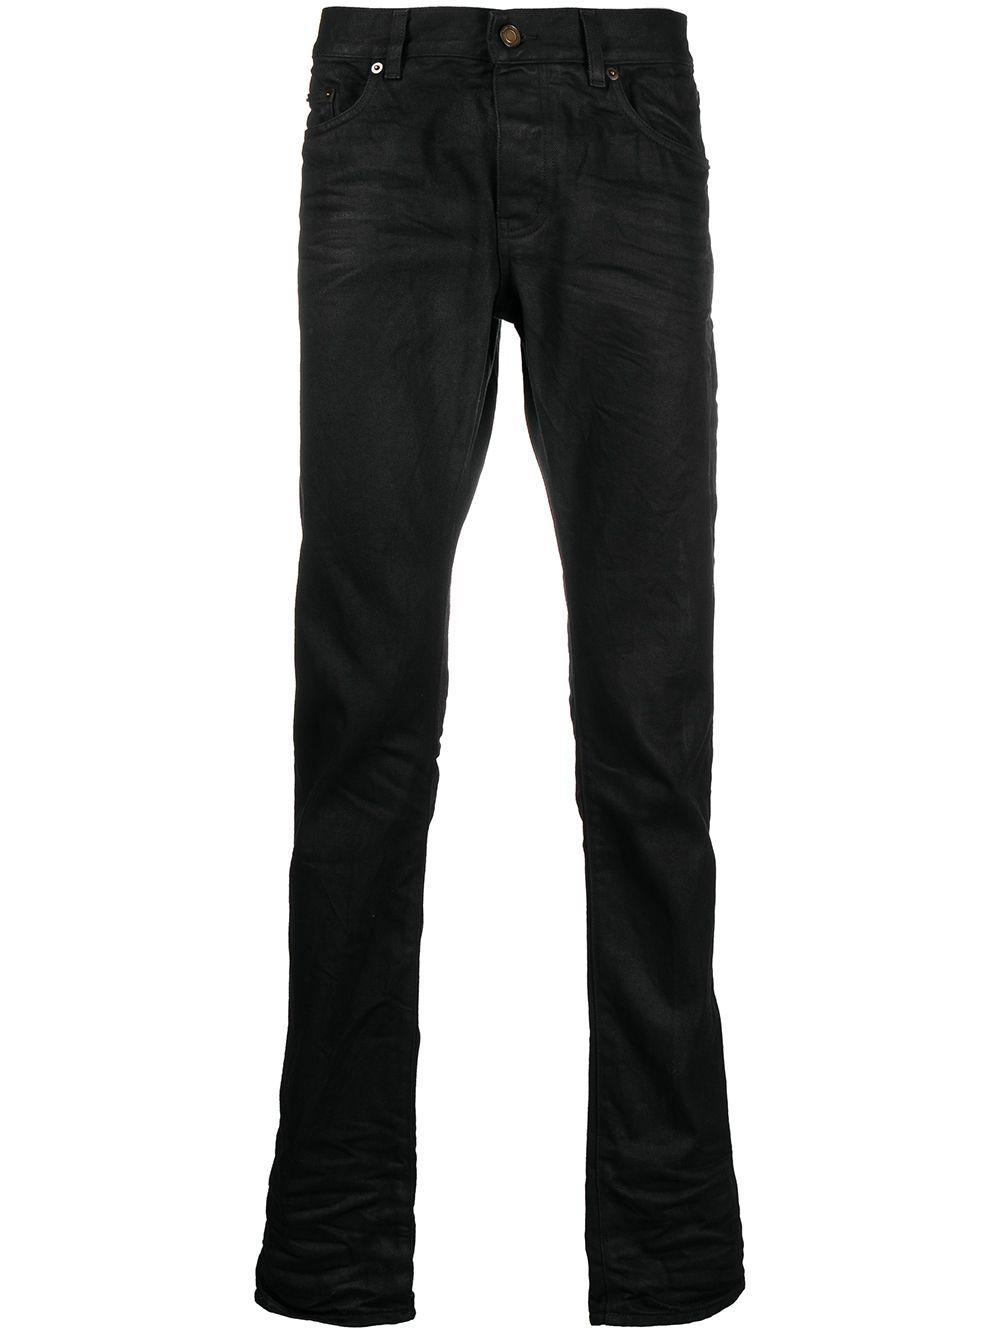 Saint laurent  jeans nero